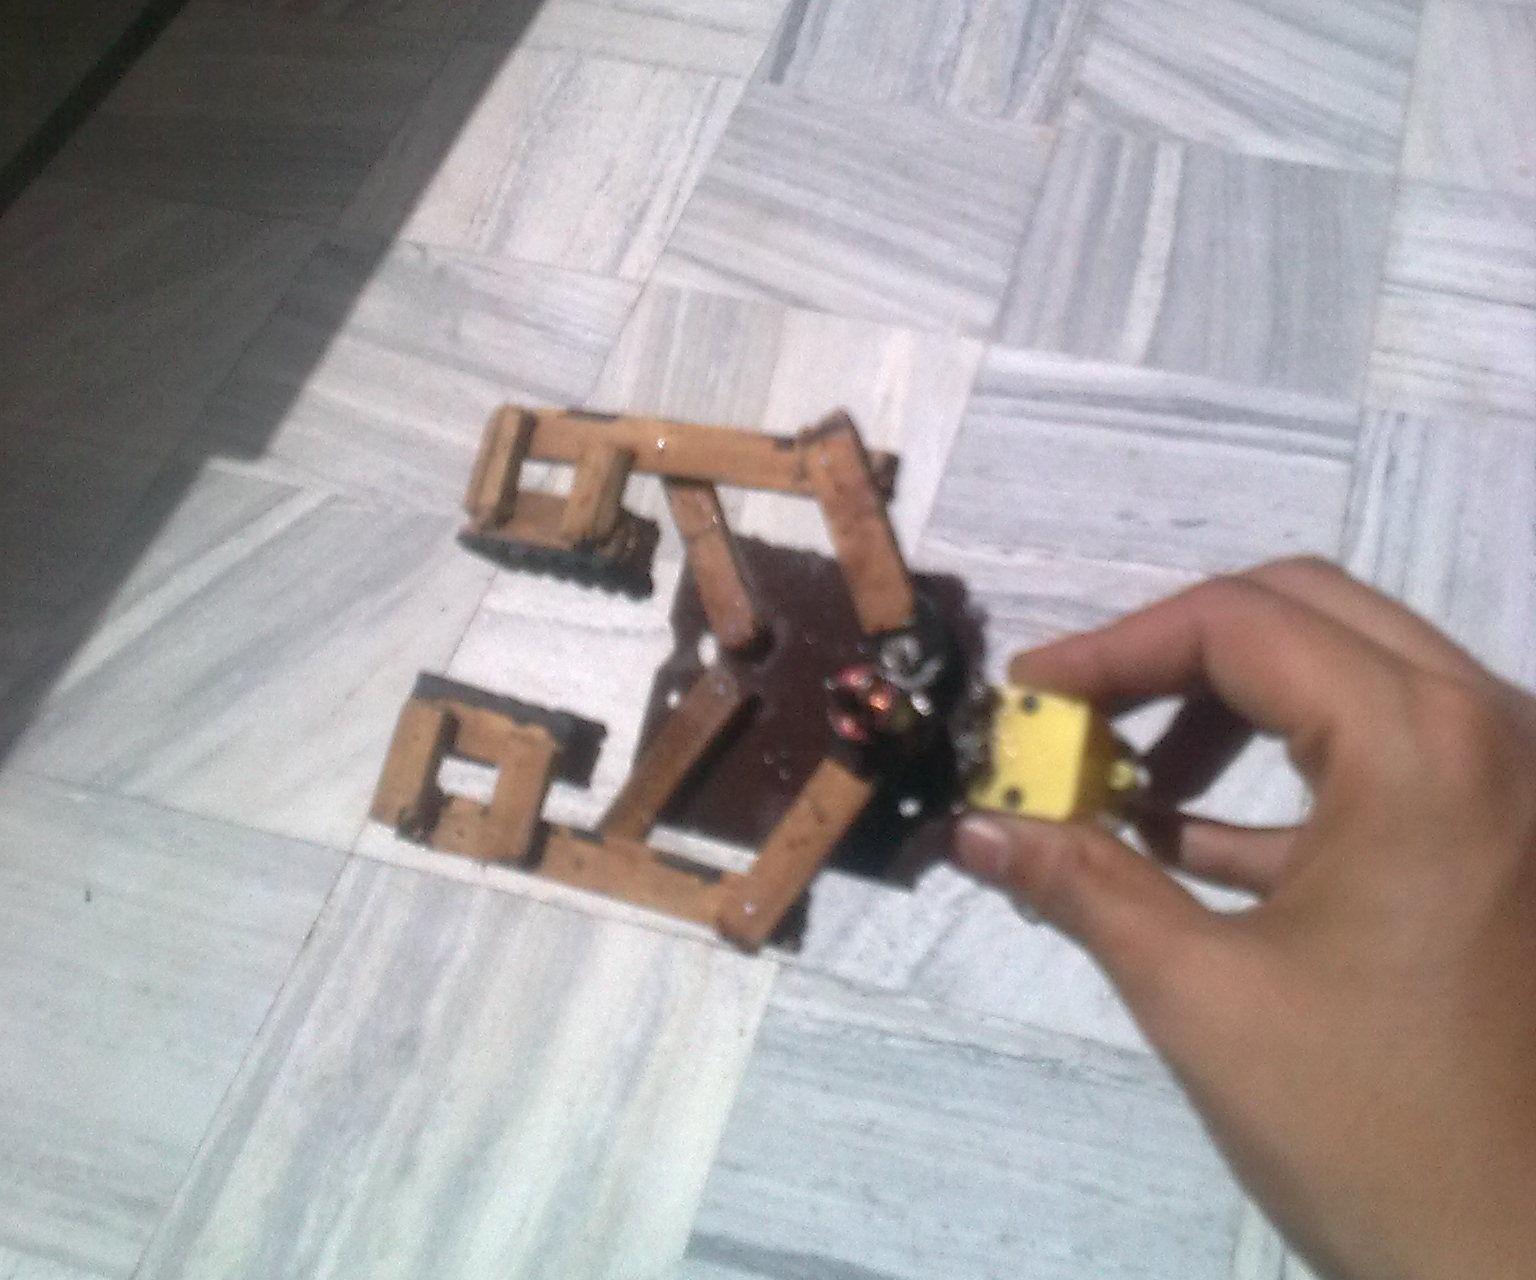 DIY ROBOTIC GRIPPER